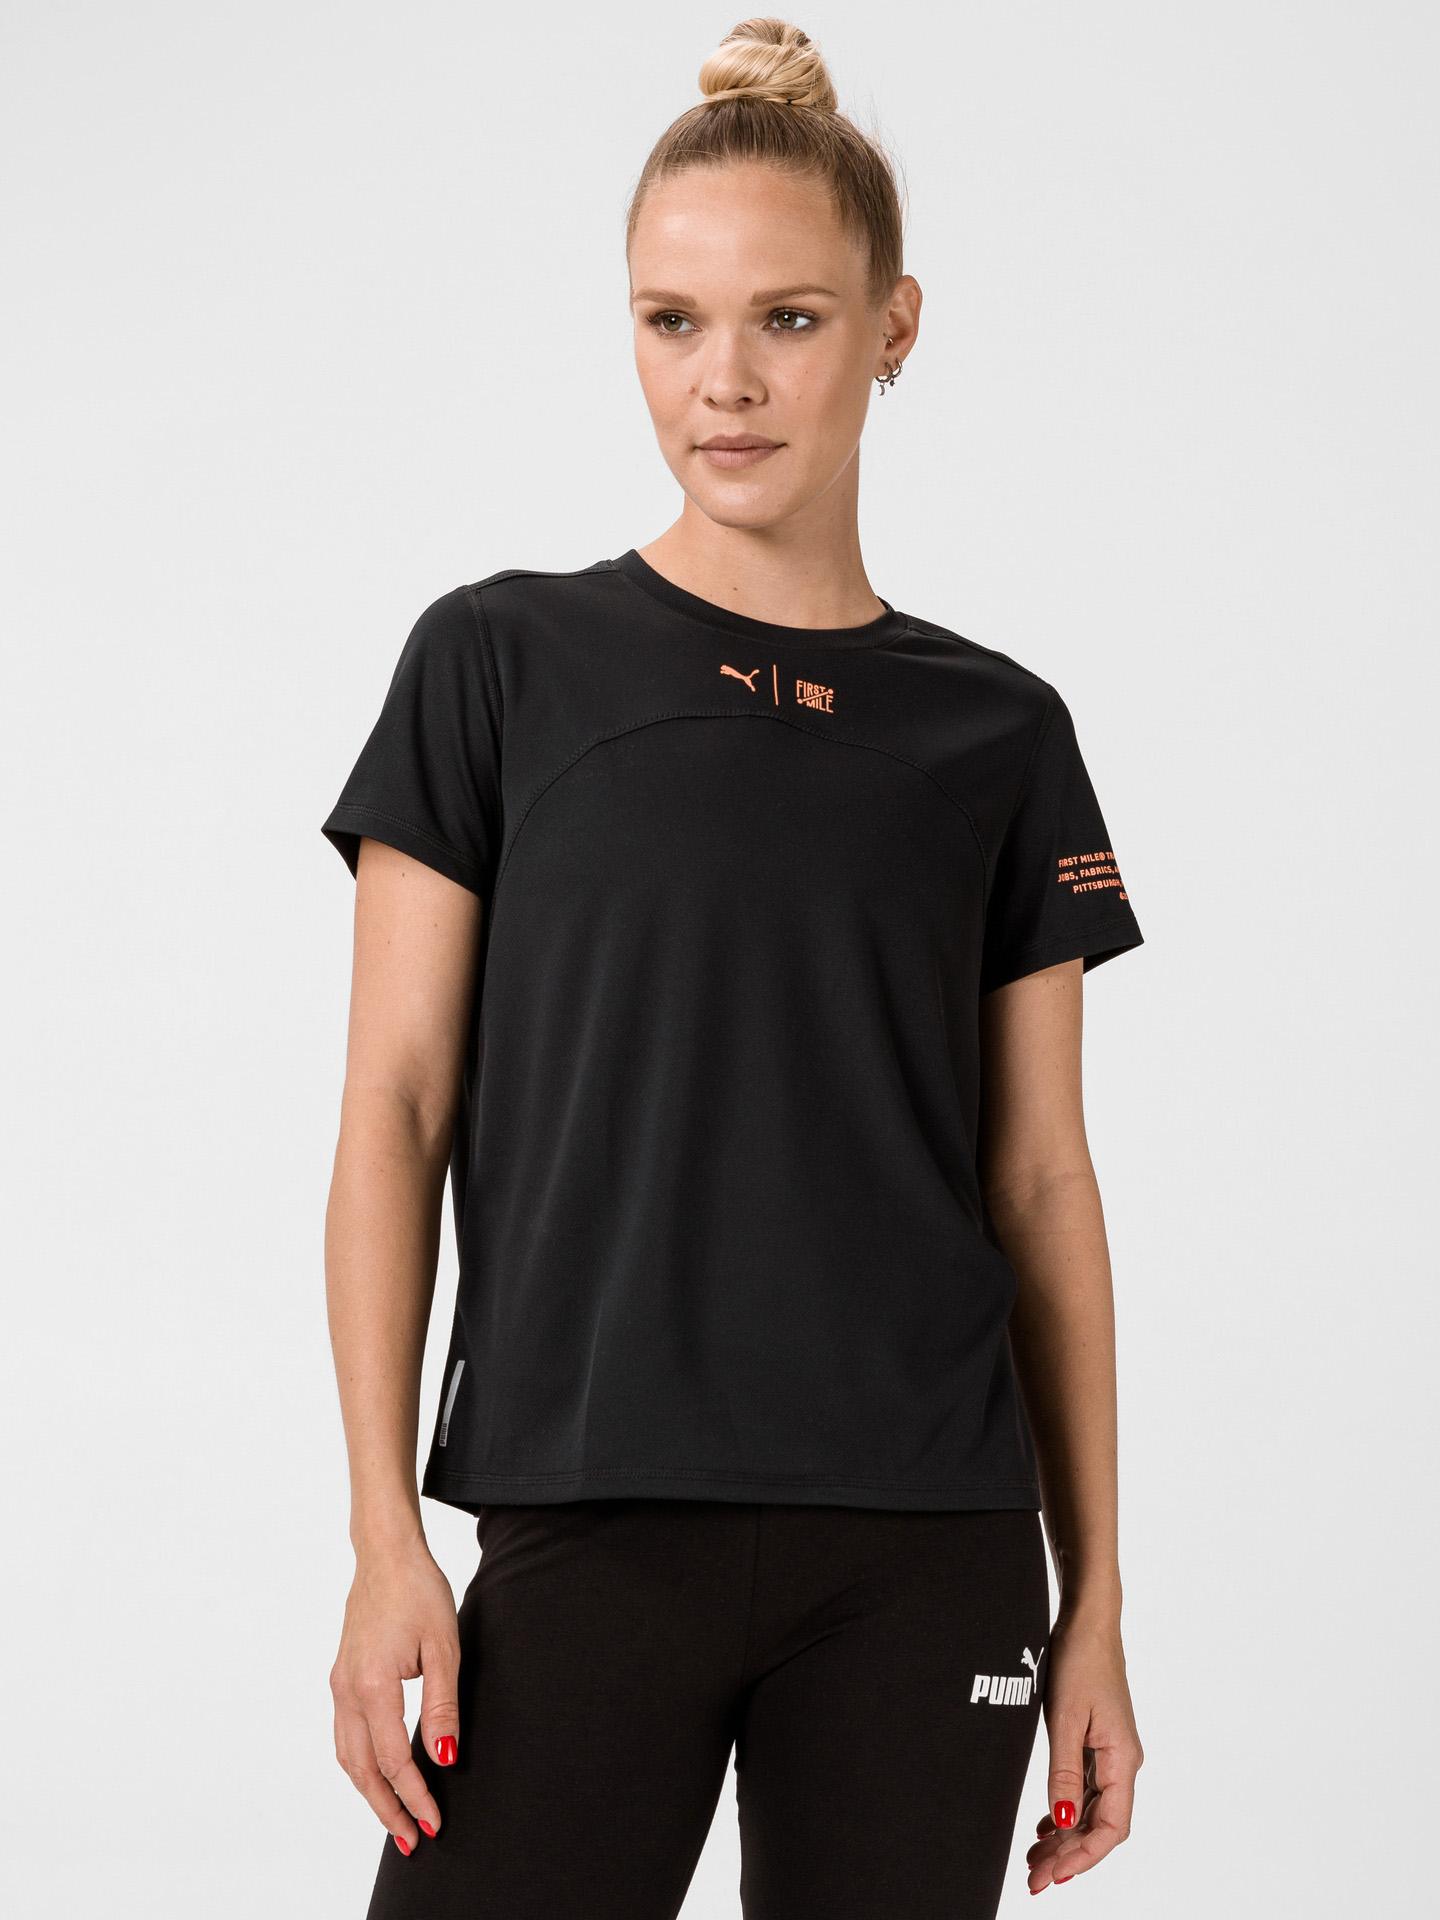 Puma čierne dámske tričko The First Mile - L